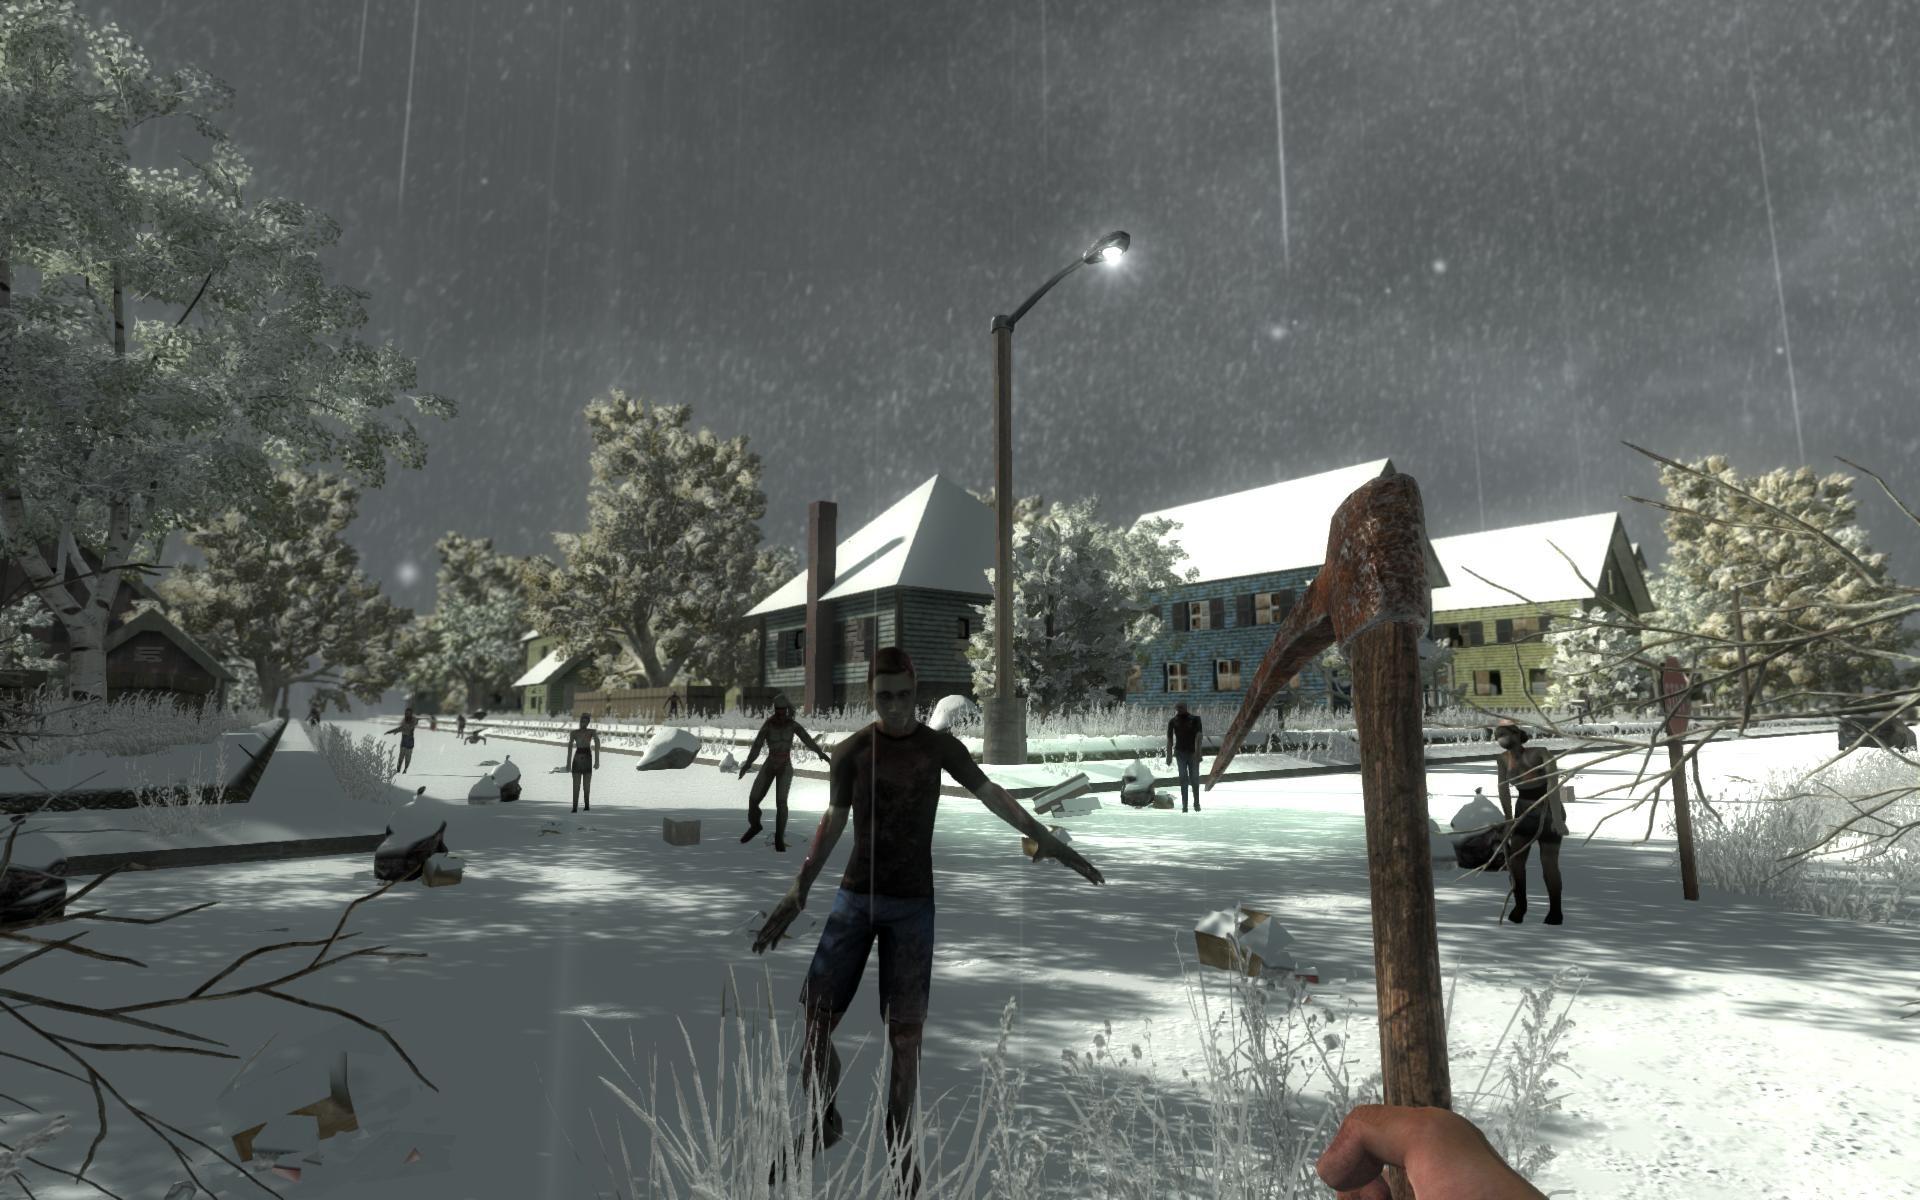 Alpha_12_Minibike_Bloodmoon Alpha_12_Snow_Diersville ·  Alpha_12_Rain_Burnt_Forest Alpha_12_Flaming_Arrow